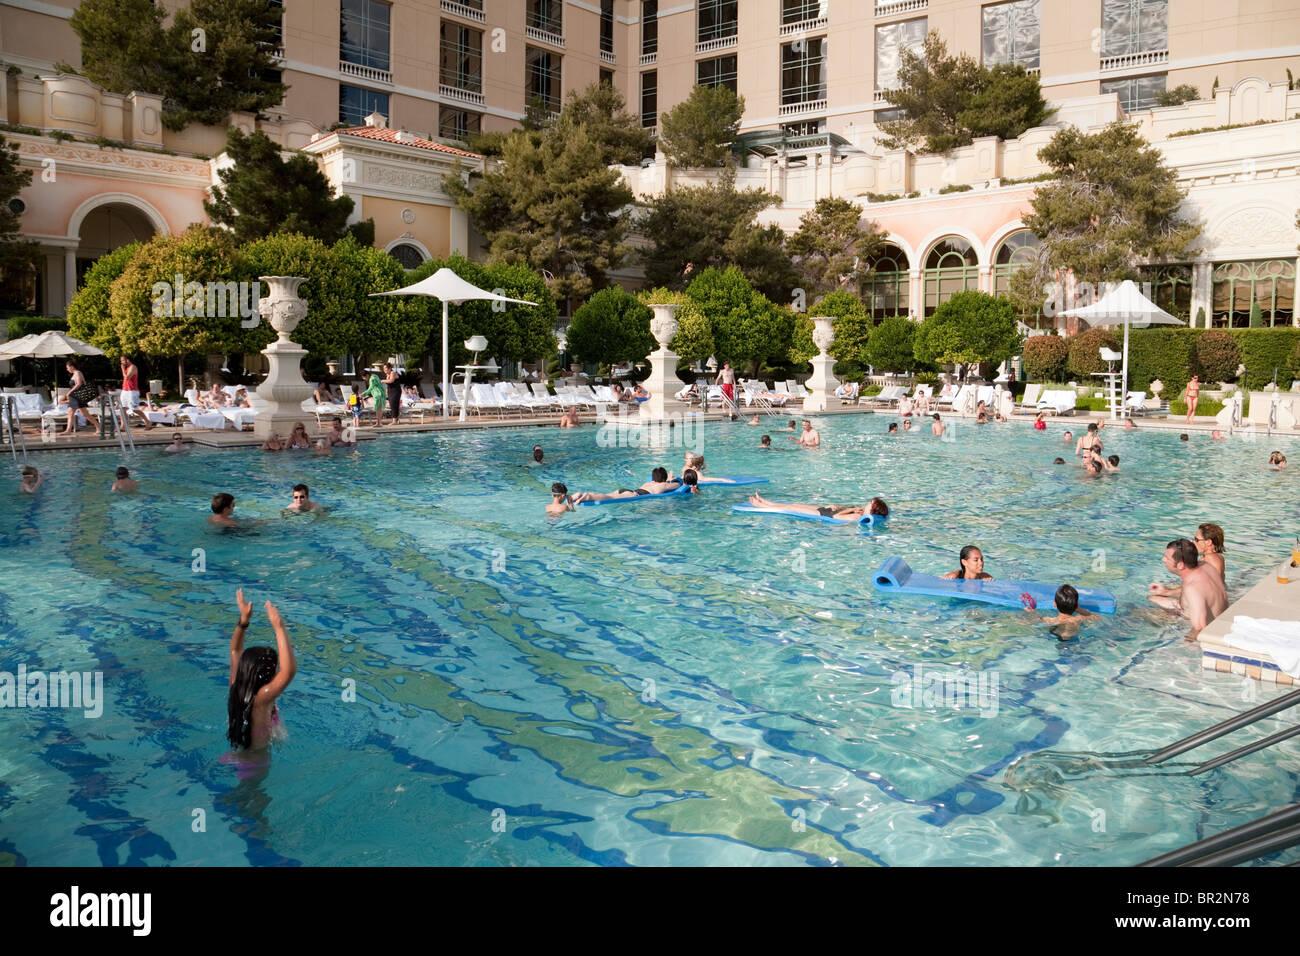 Swimming Pool Las Vegas Stock Photos Swimming Pool Las Vegas Stock Images Alamy